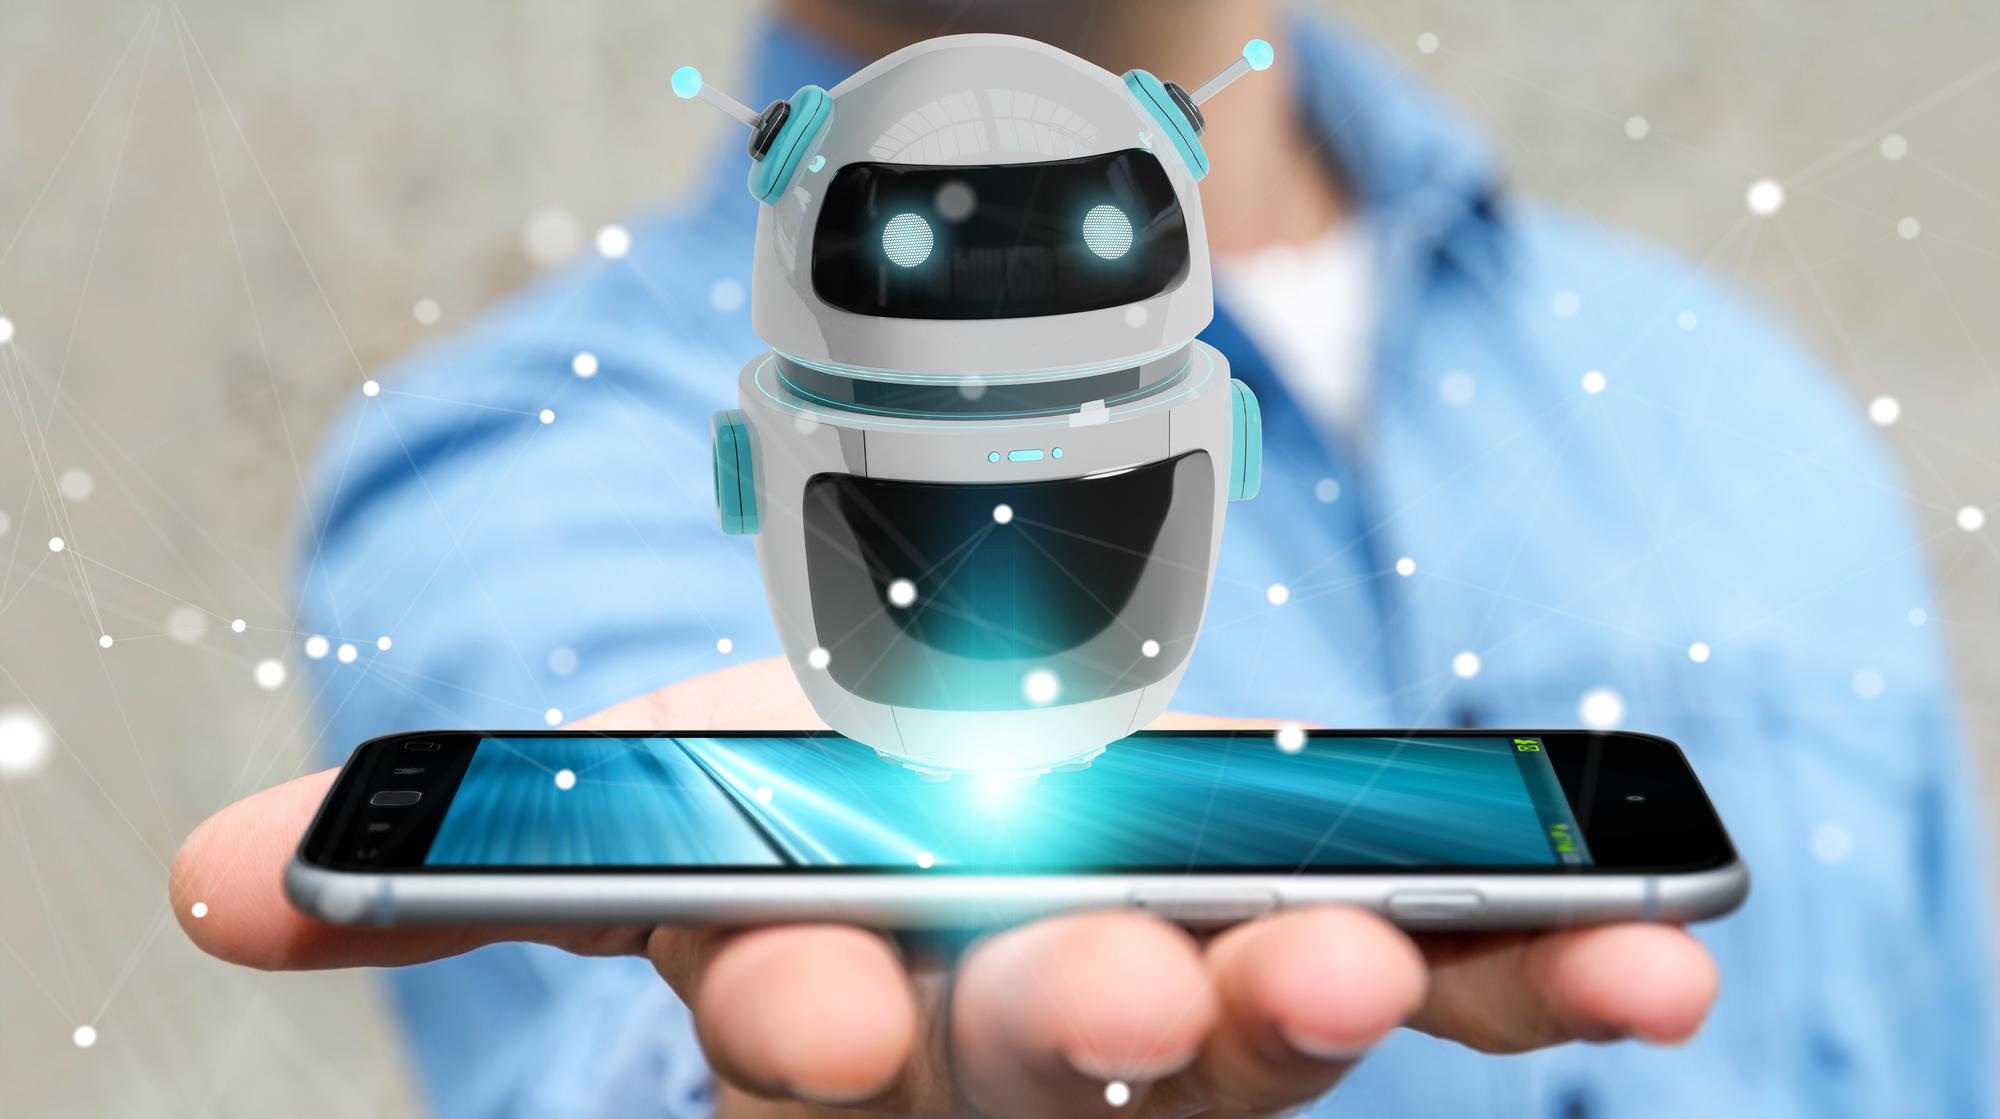 Bot su uno smartphone